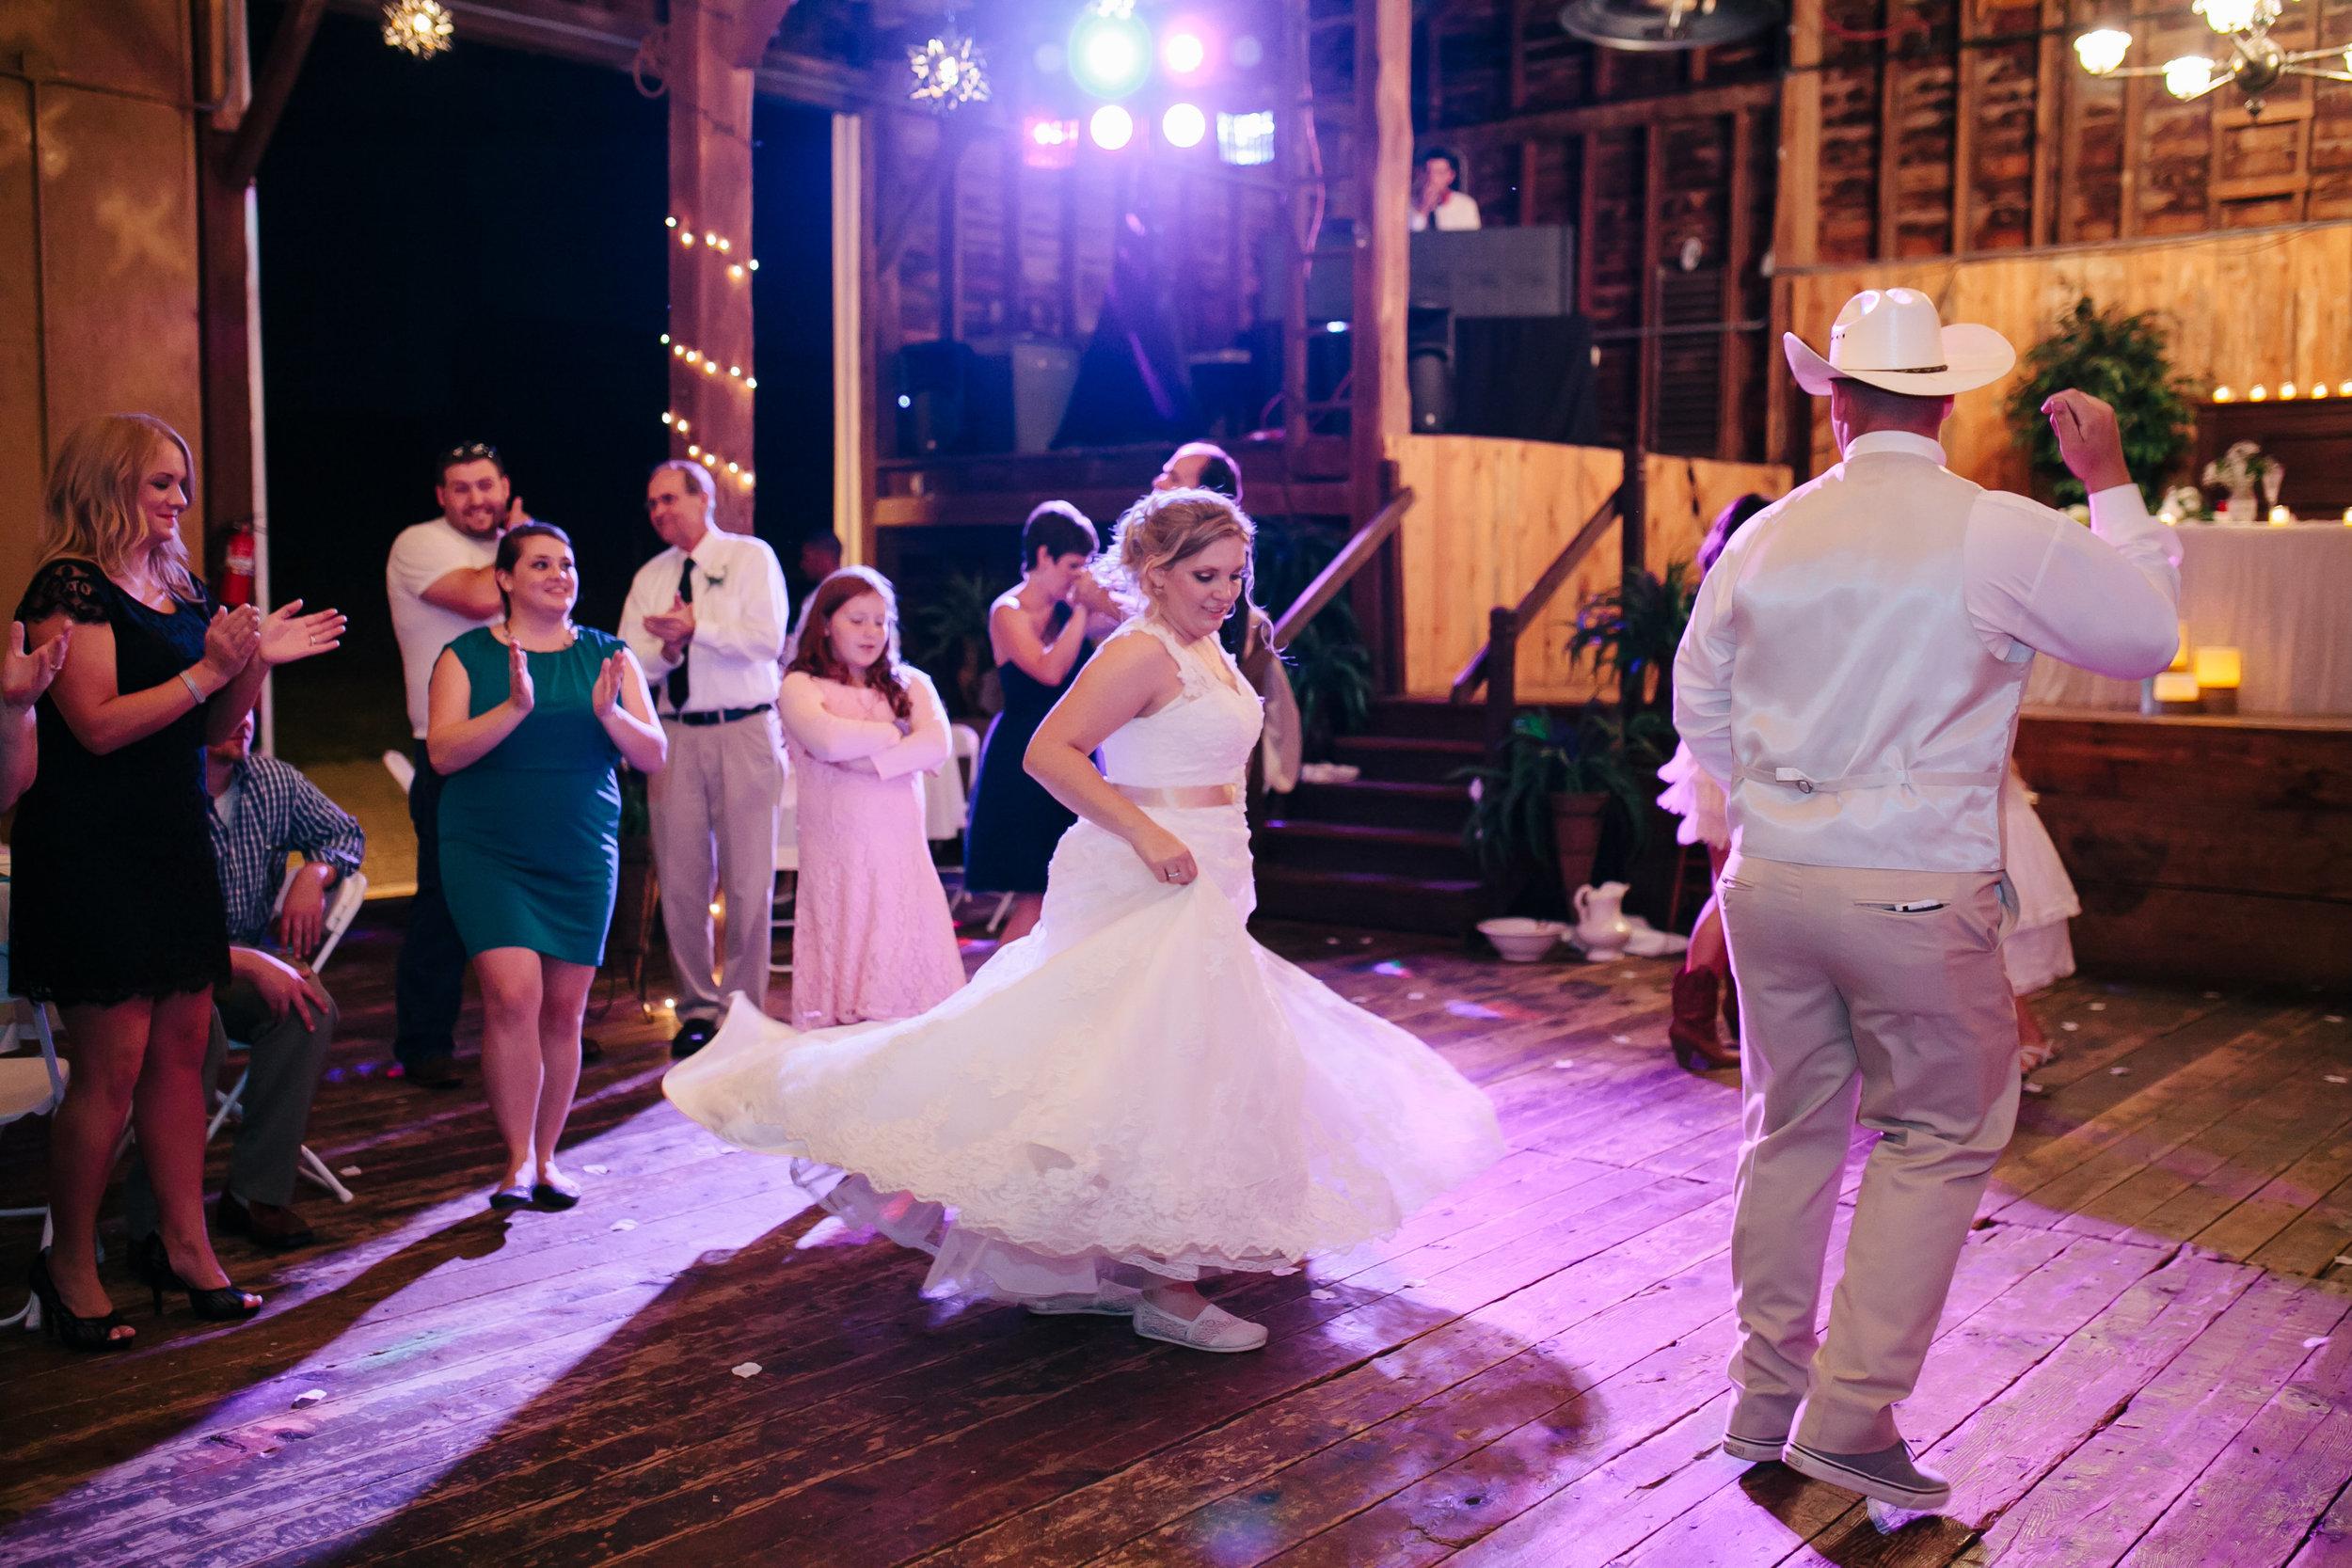 Hearne Wedding | Spring Meadows Farm, Mt. Solon |  Simply Memorable Photography